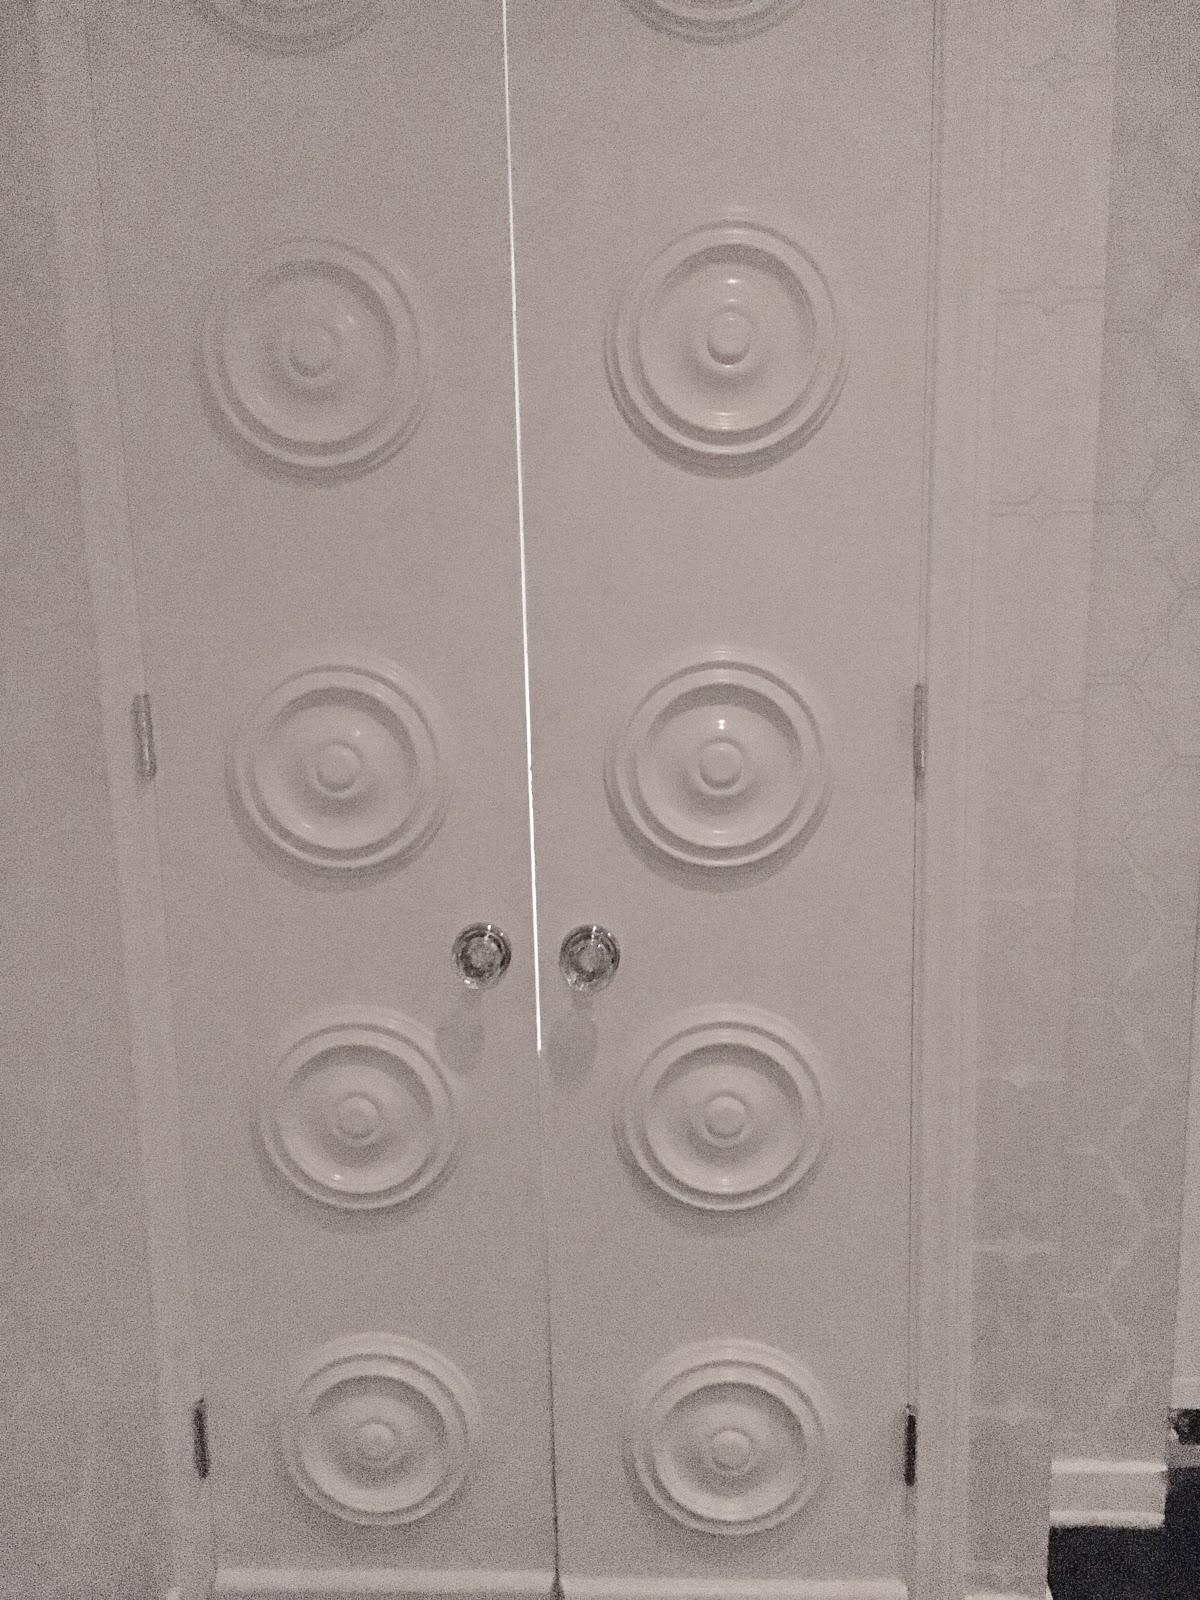 French Door Salon And Spa Gallery Door Design For Home